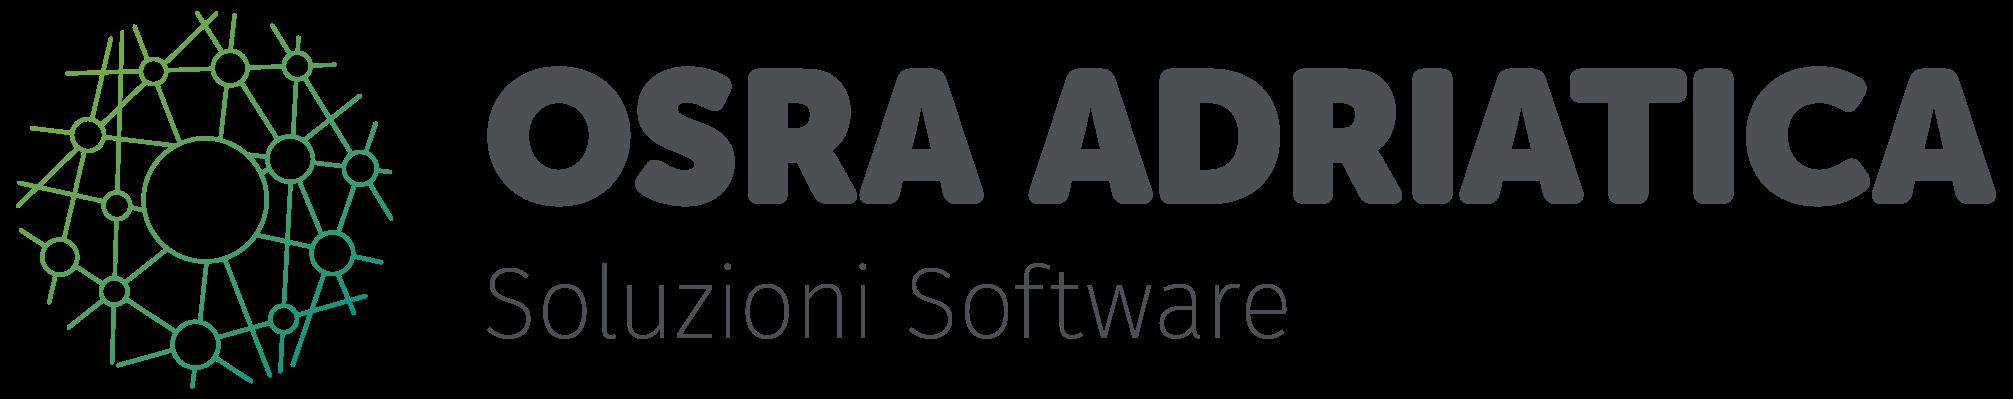 Osra Adriatica – Soluzioni Software